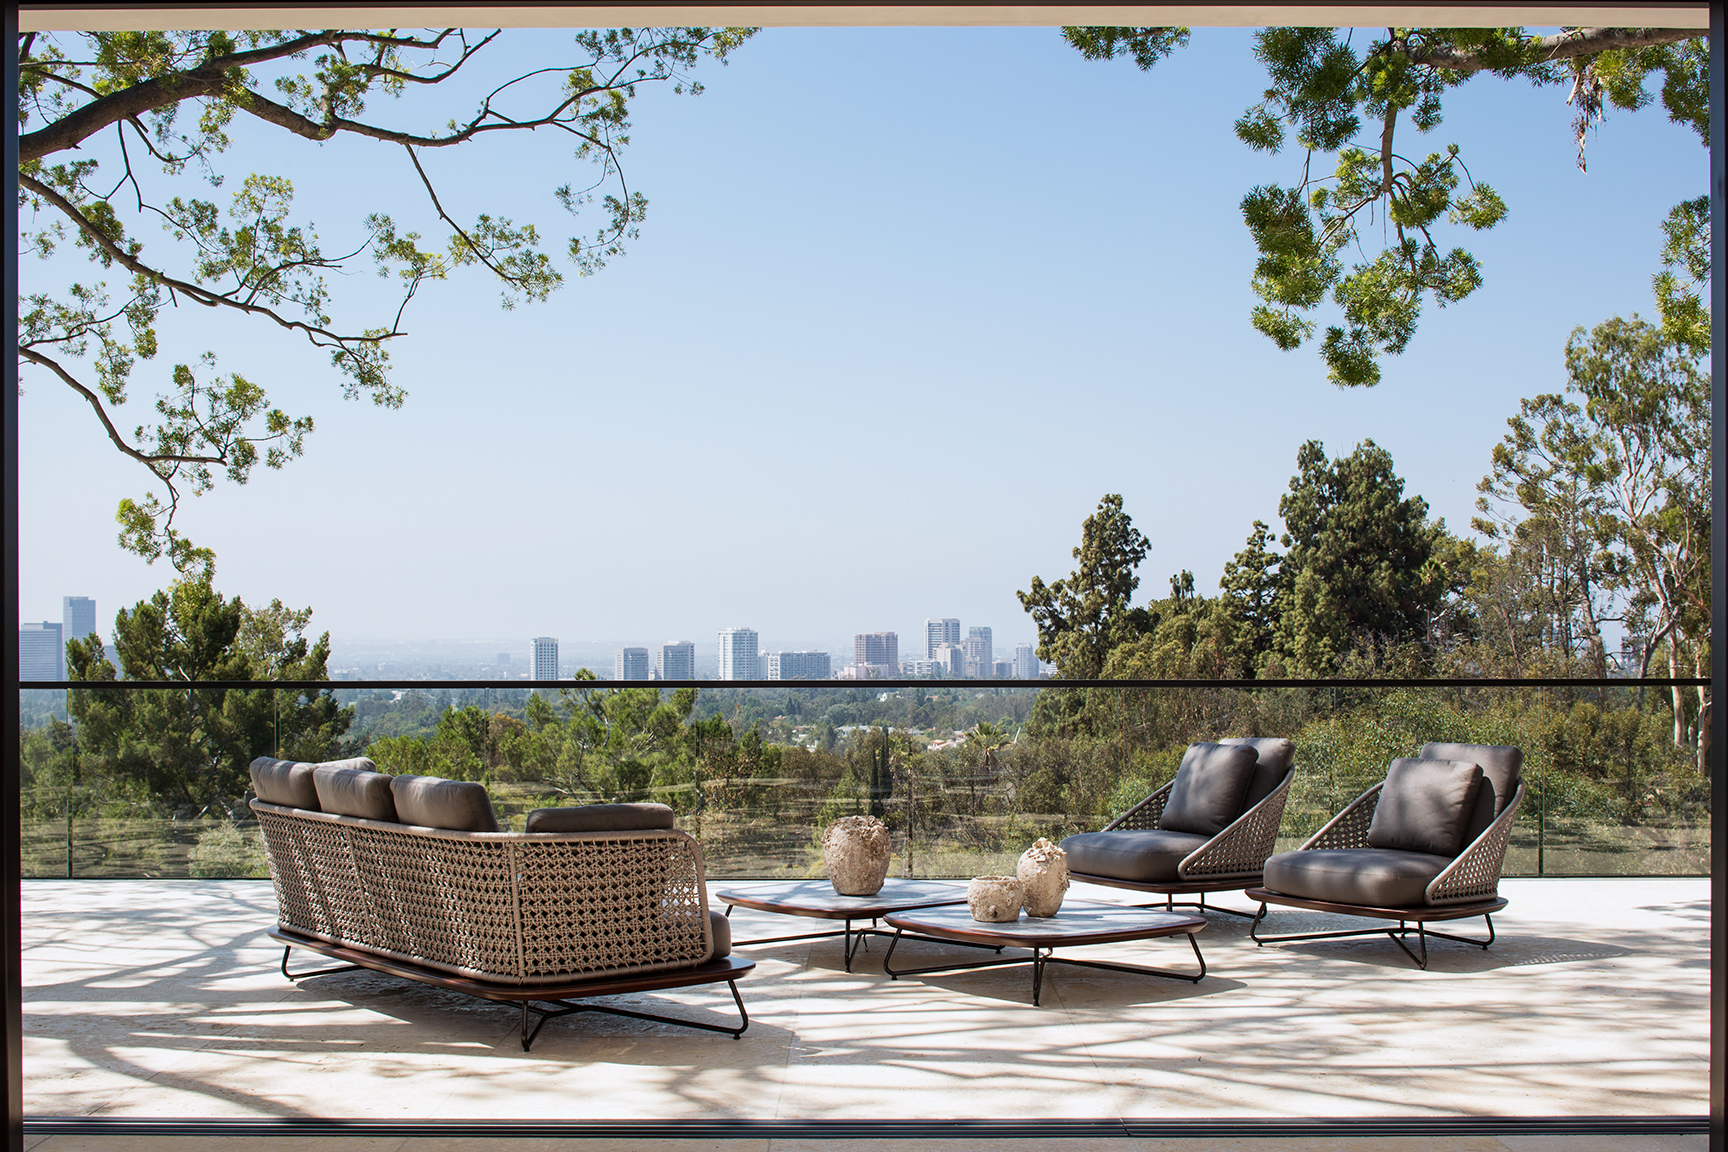 LuxuryMagazine_TowerGrove_ExteriorView_Meghanbob_WEB.jpg